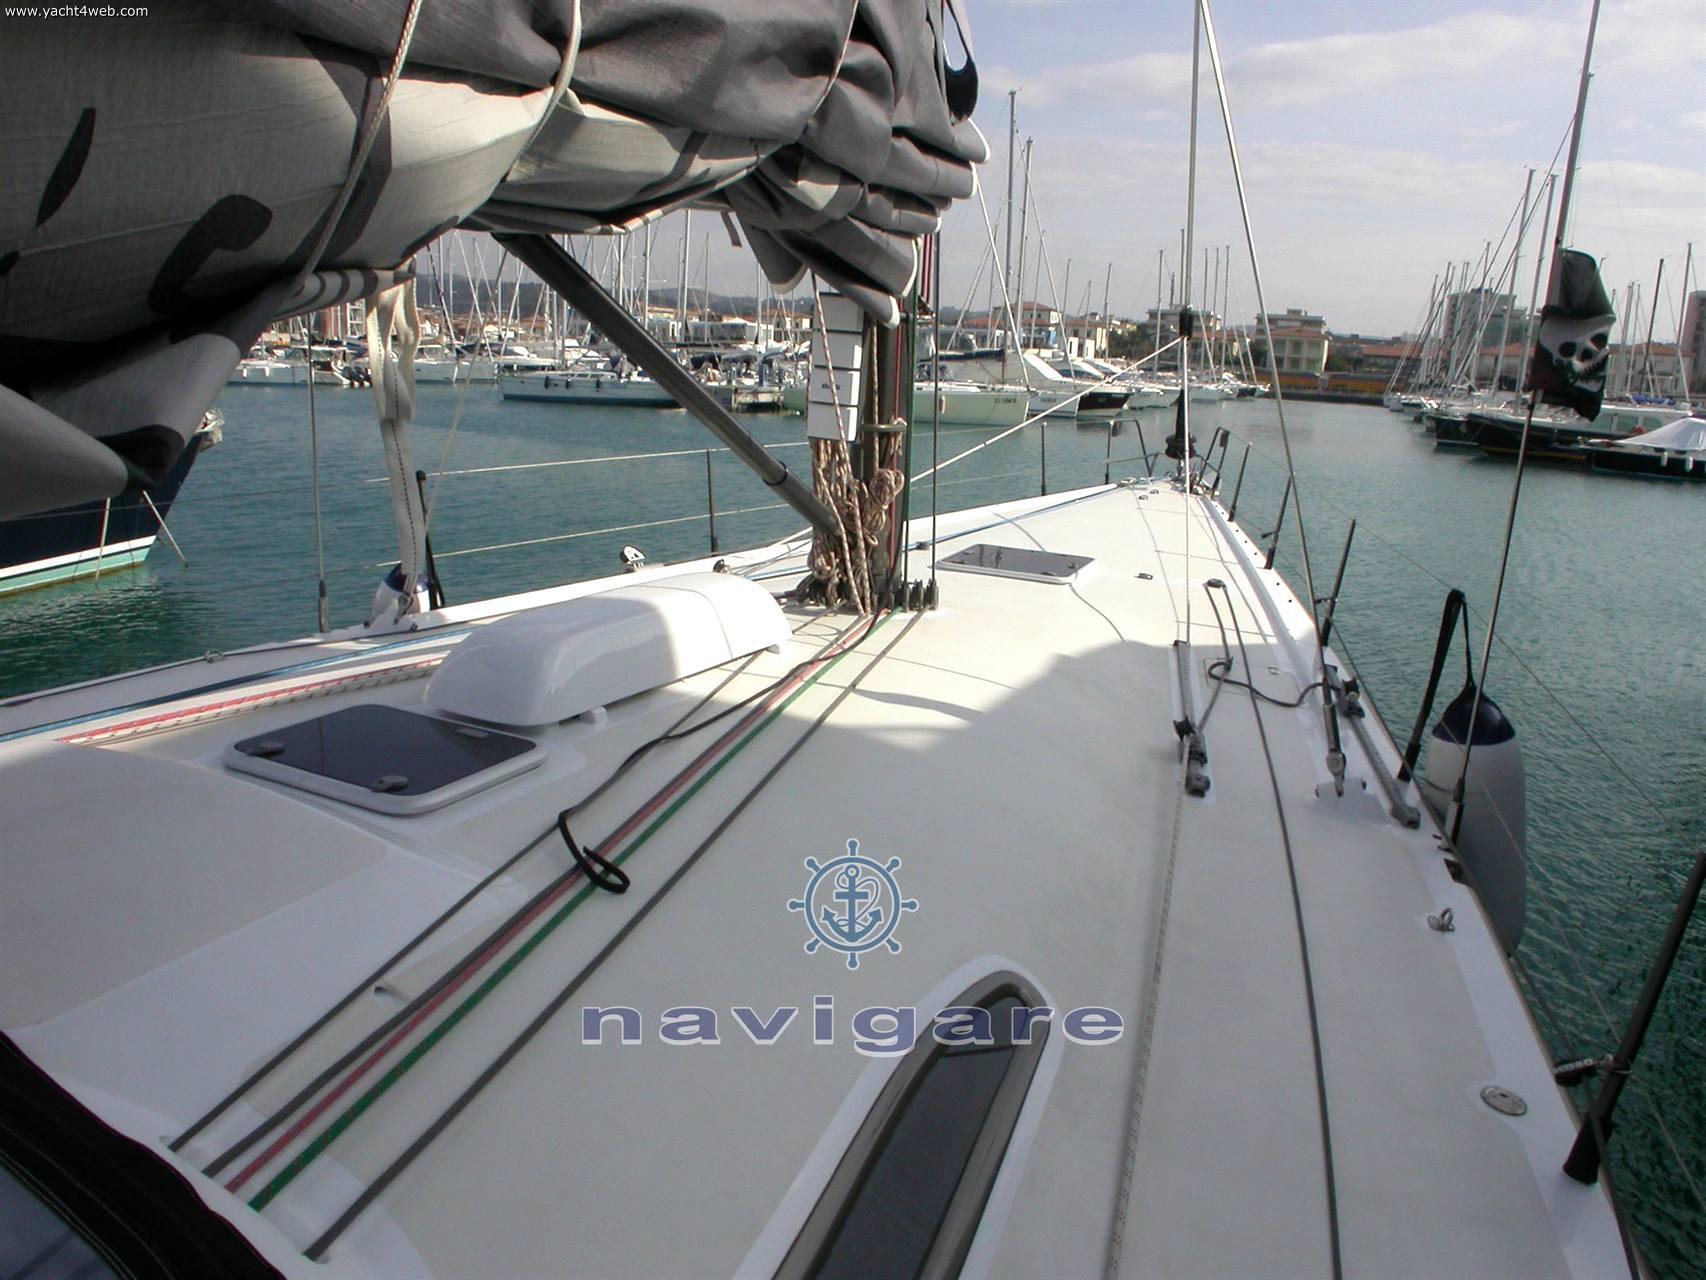 BAKEWELL WHITE YACHT Pocket maxi 67 sailing boat